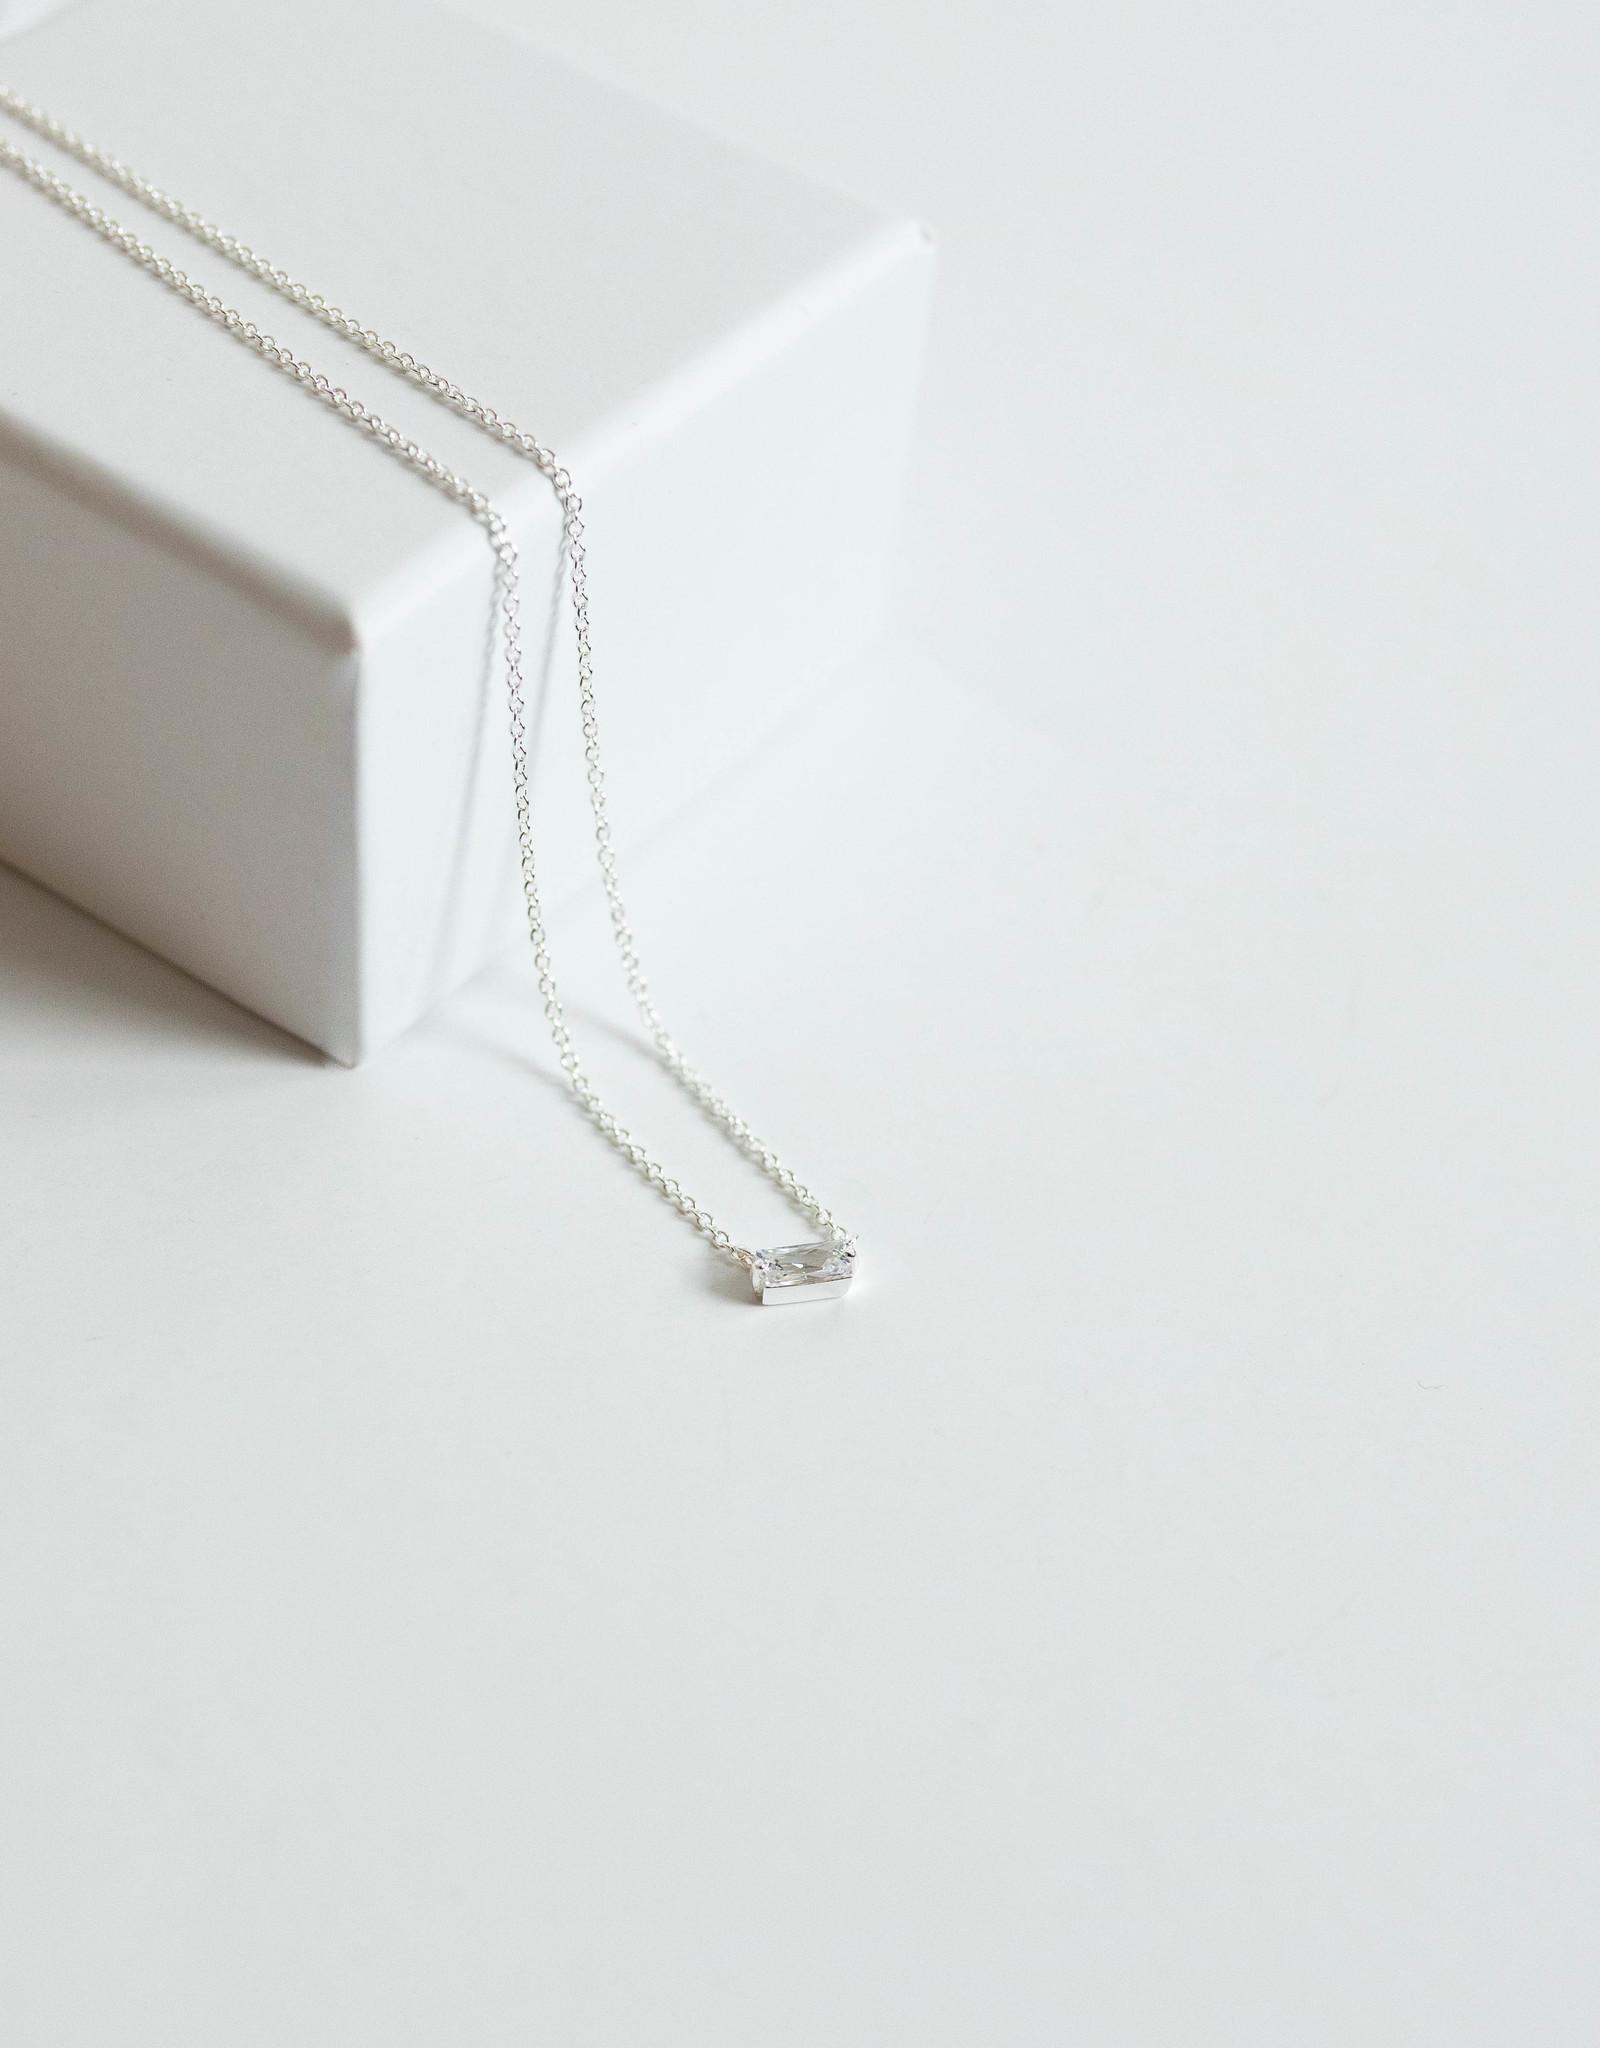 Gorjana Amara Solitaire Neck Silver